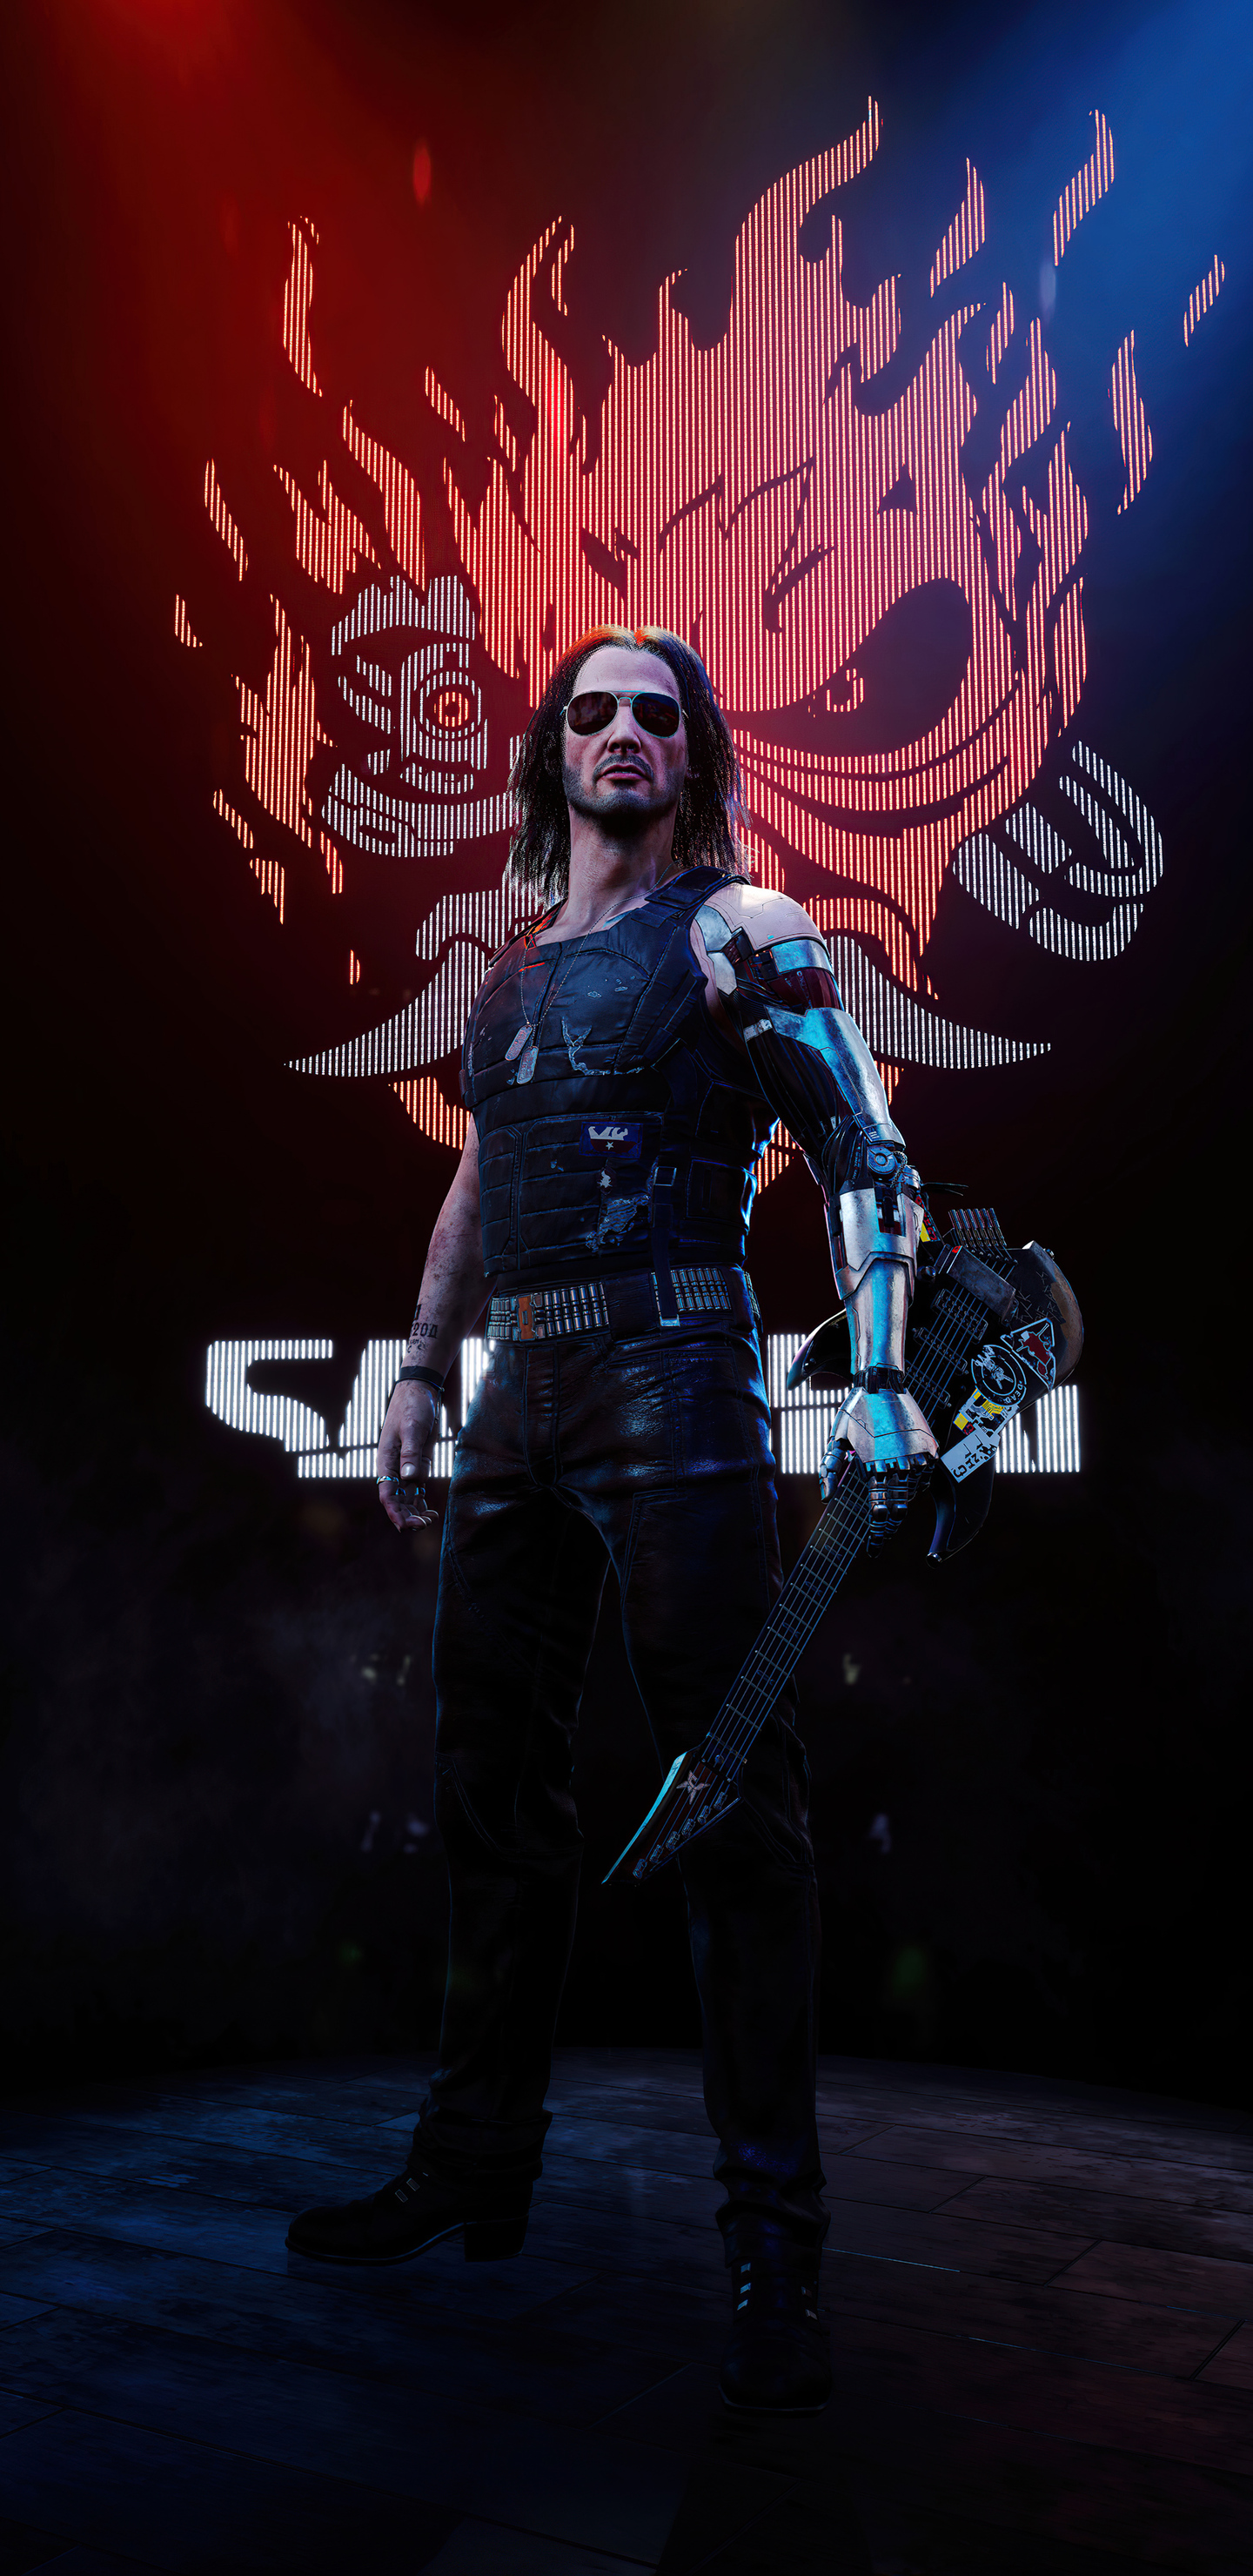 cyberpunk-2077-johnny-silverhand-game-4k-yg.jpg